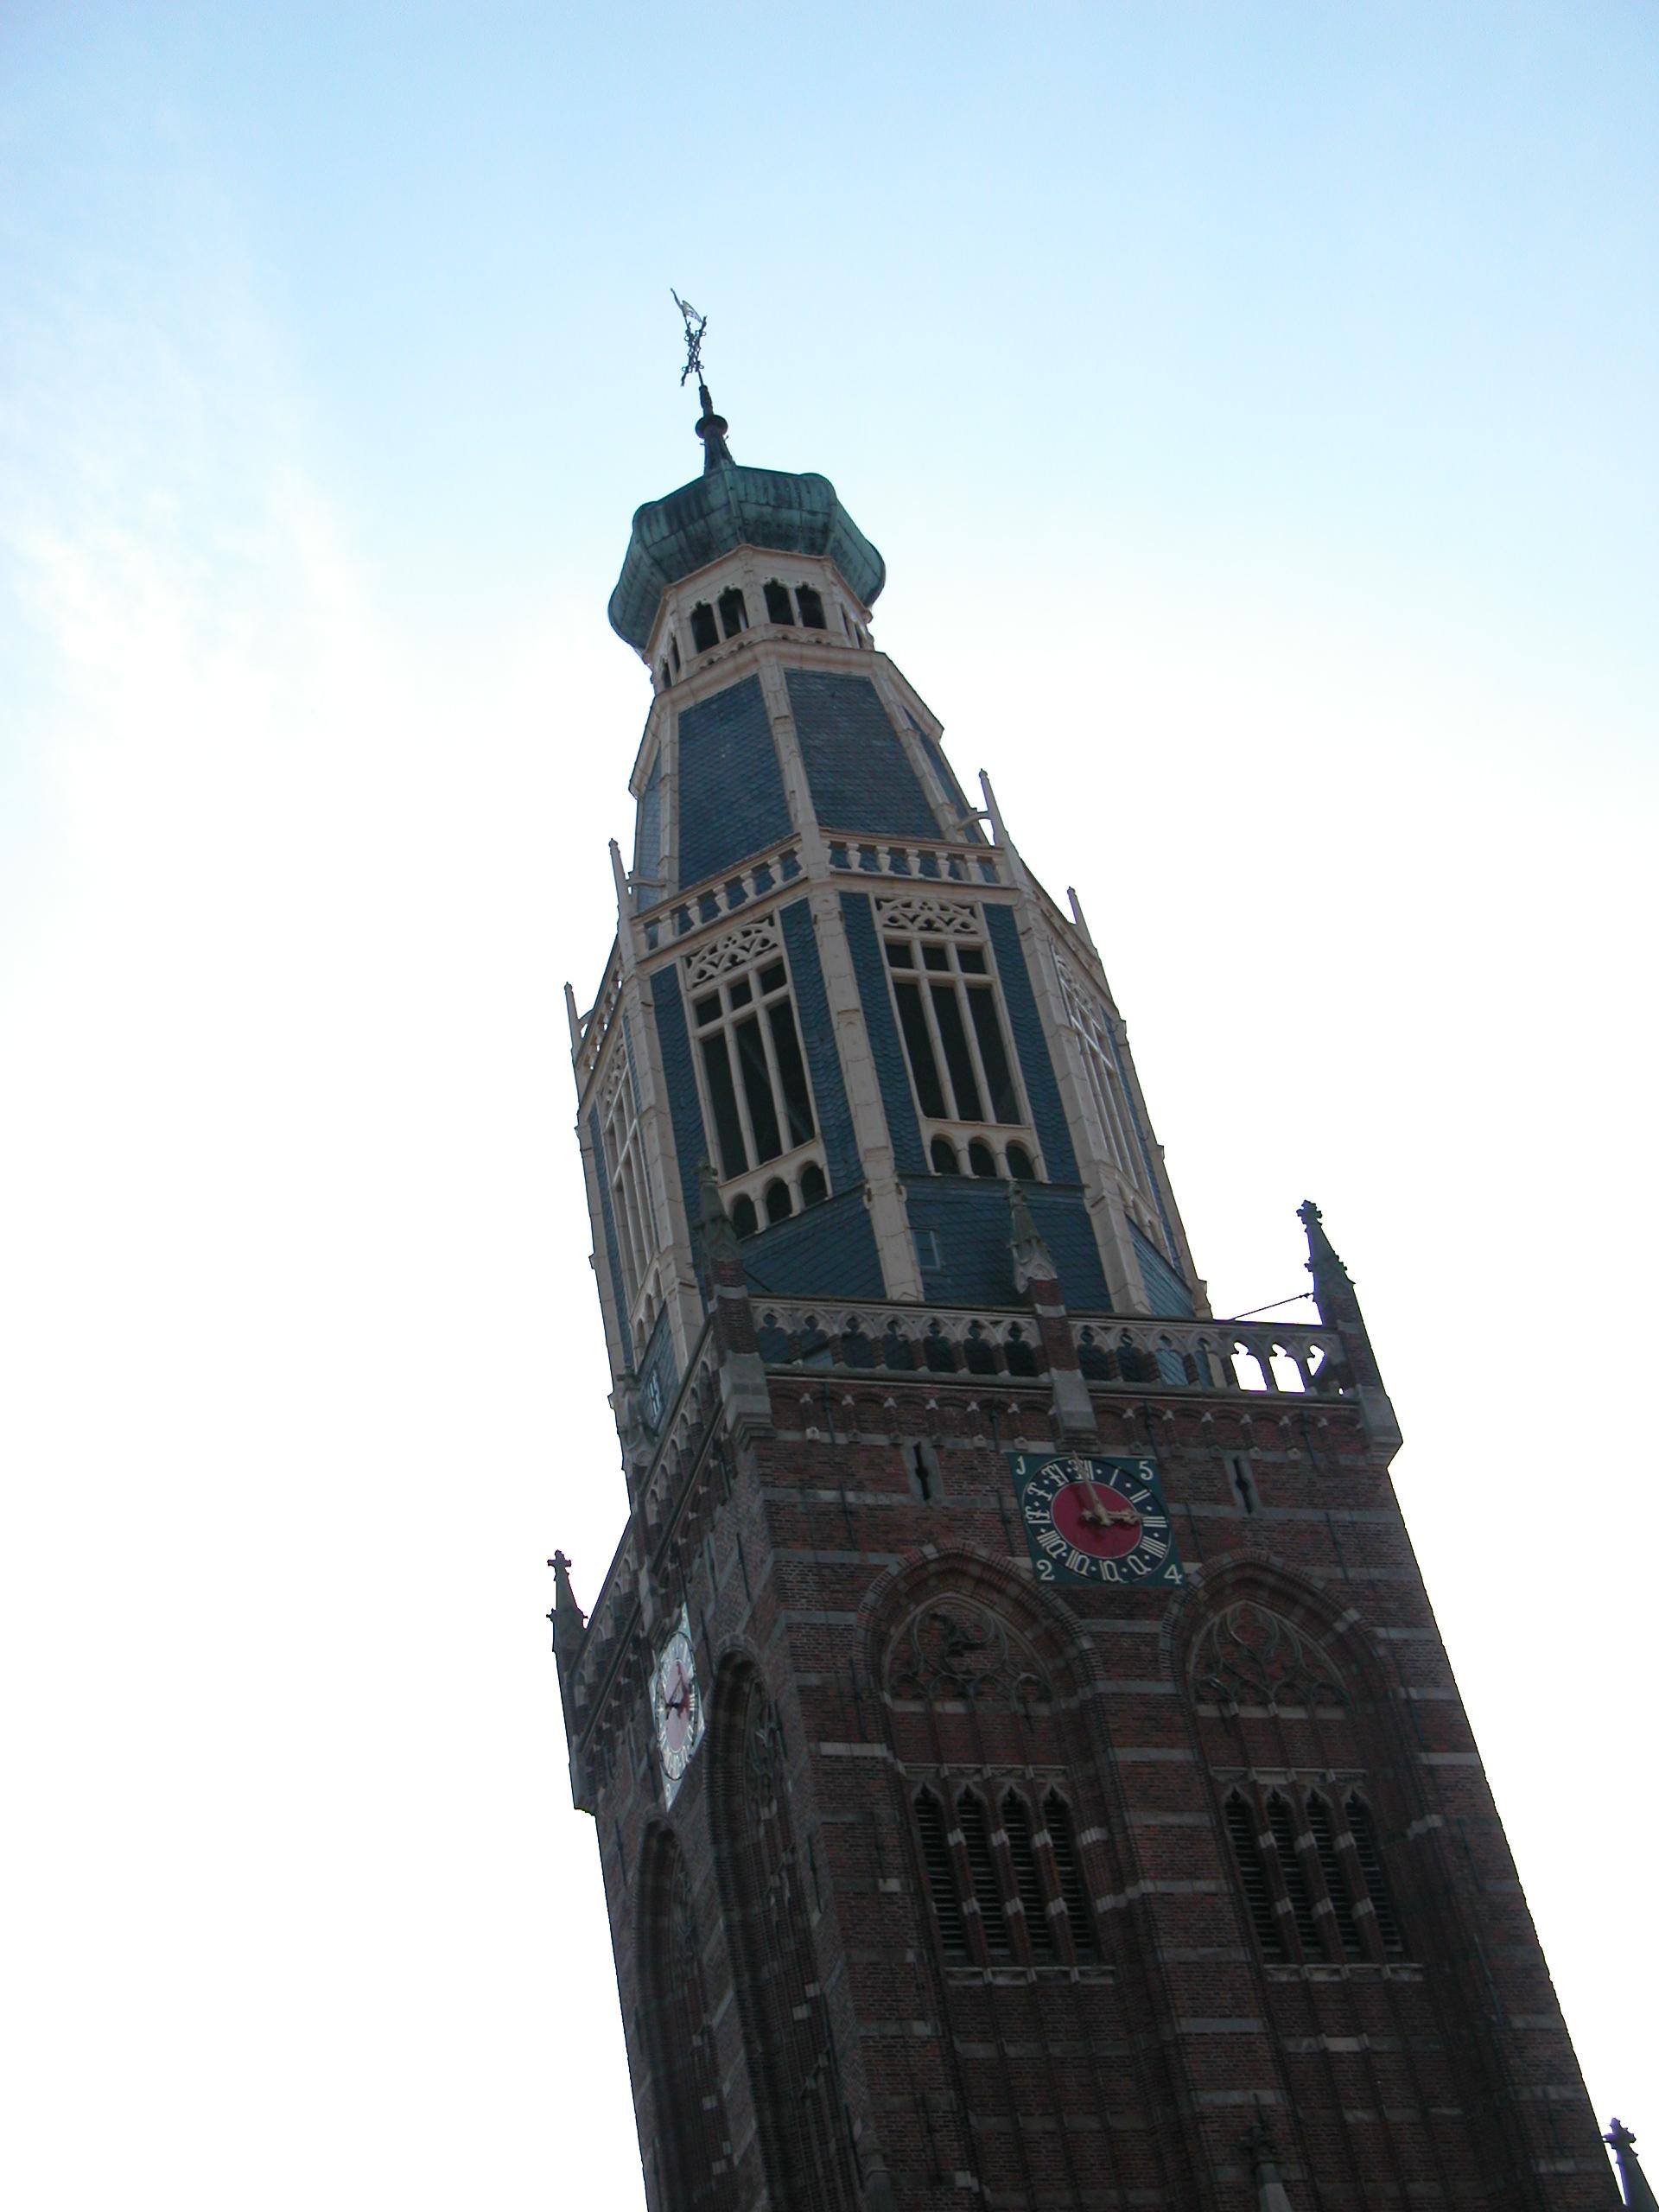 tower steeple black outline church high rising clock spire